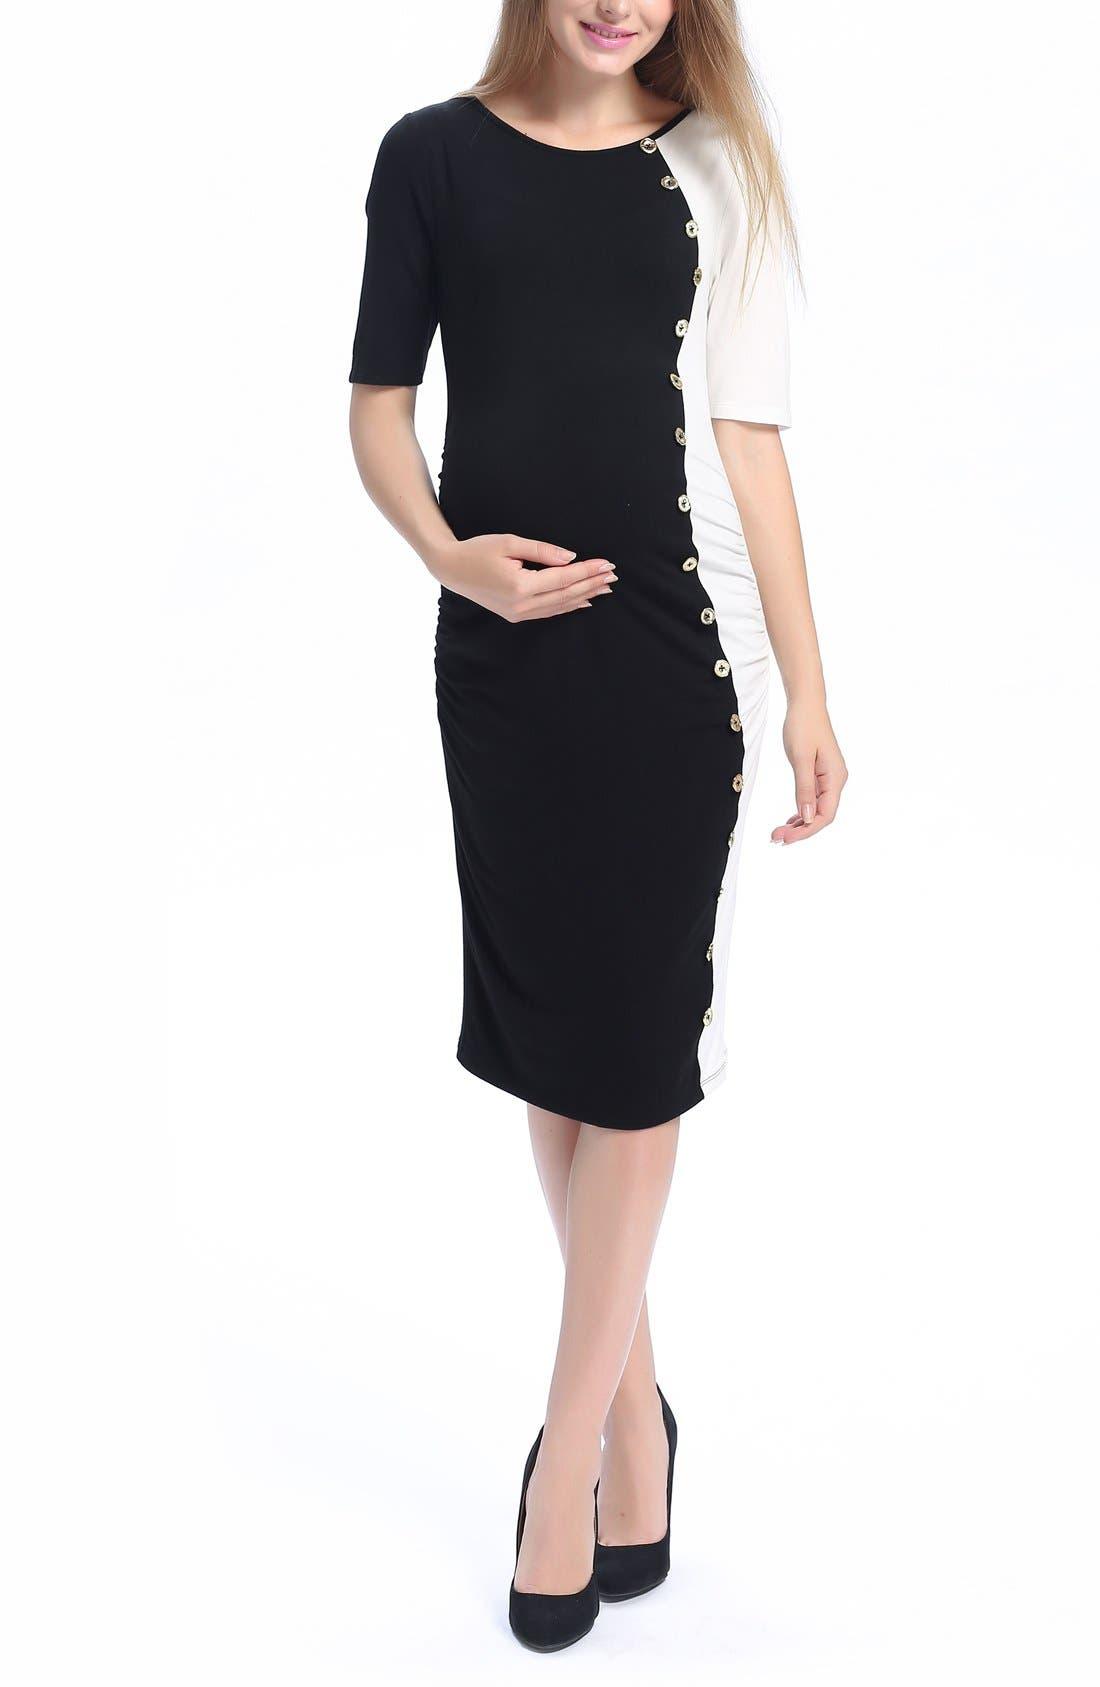 Daphne Colorblock Maternity Dress,                         Main,                         color, Black/ White